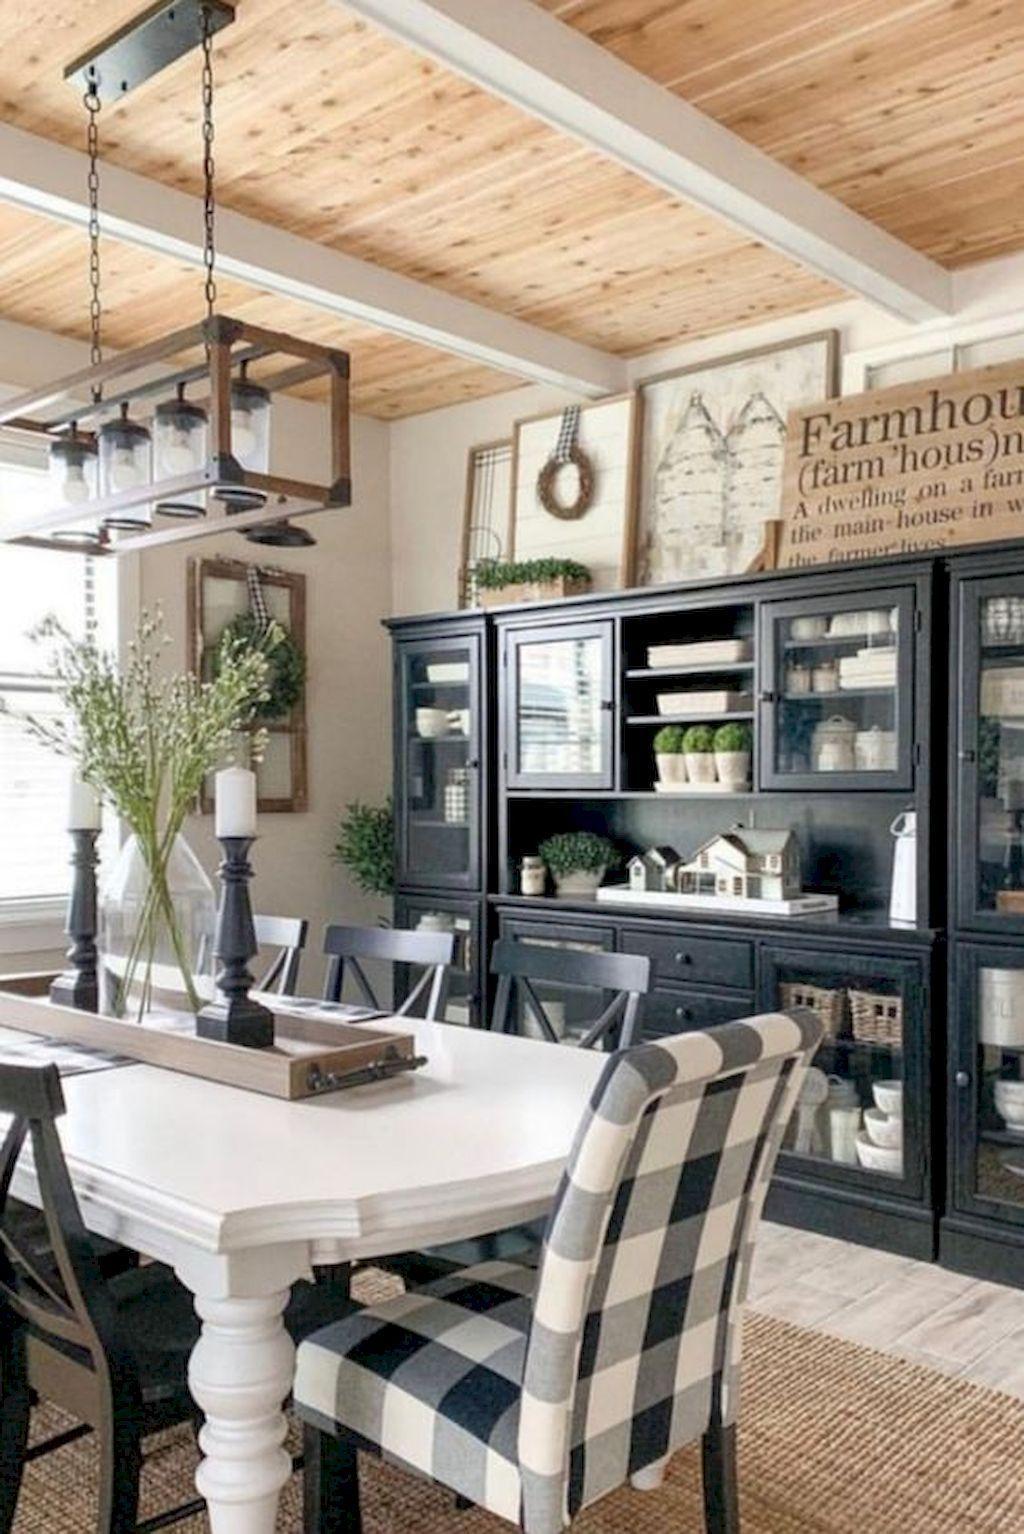 Stunning Farmhouse Interior Design Ideas To Realize Your Dreams 30